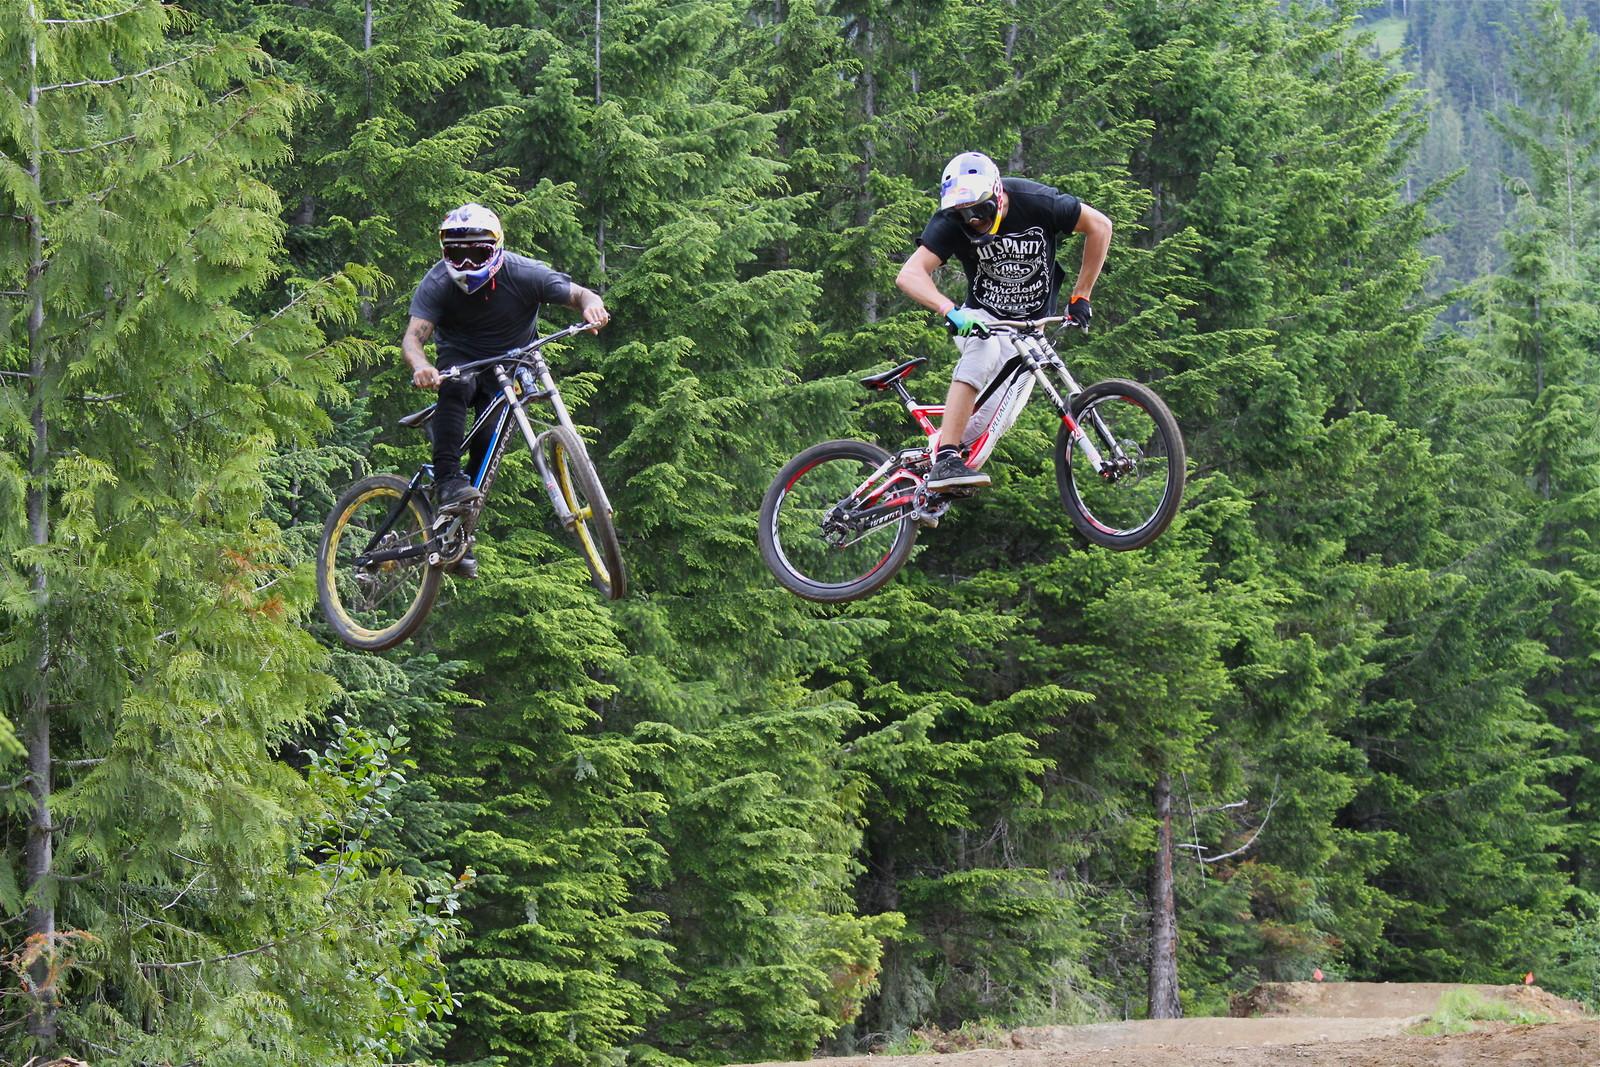 Lacondeguy & Soderstrom - Malcolm Mclaws - Mountain Biking Pictures - Vital MTB